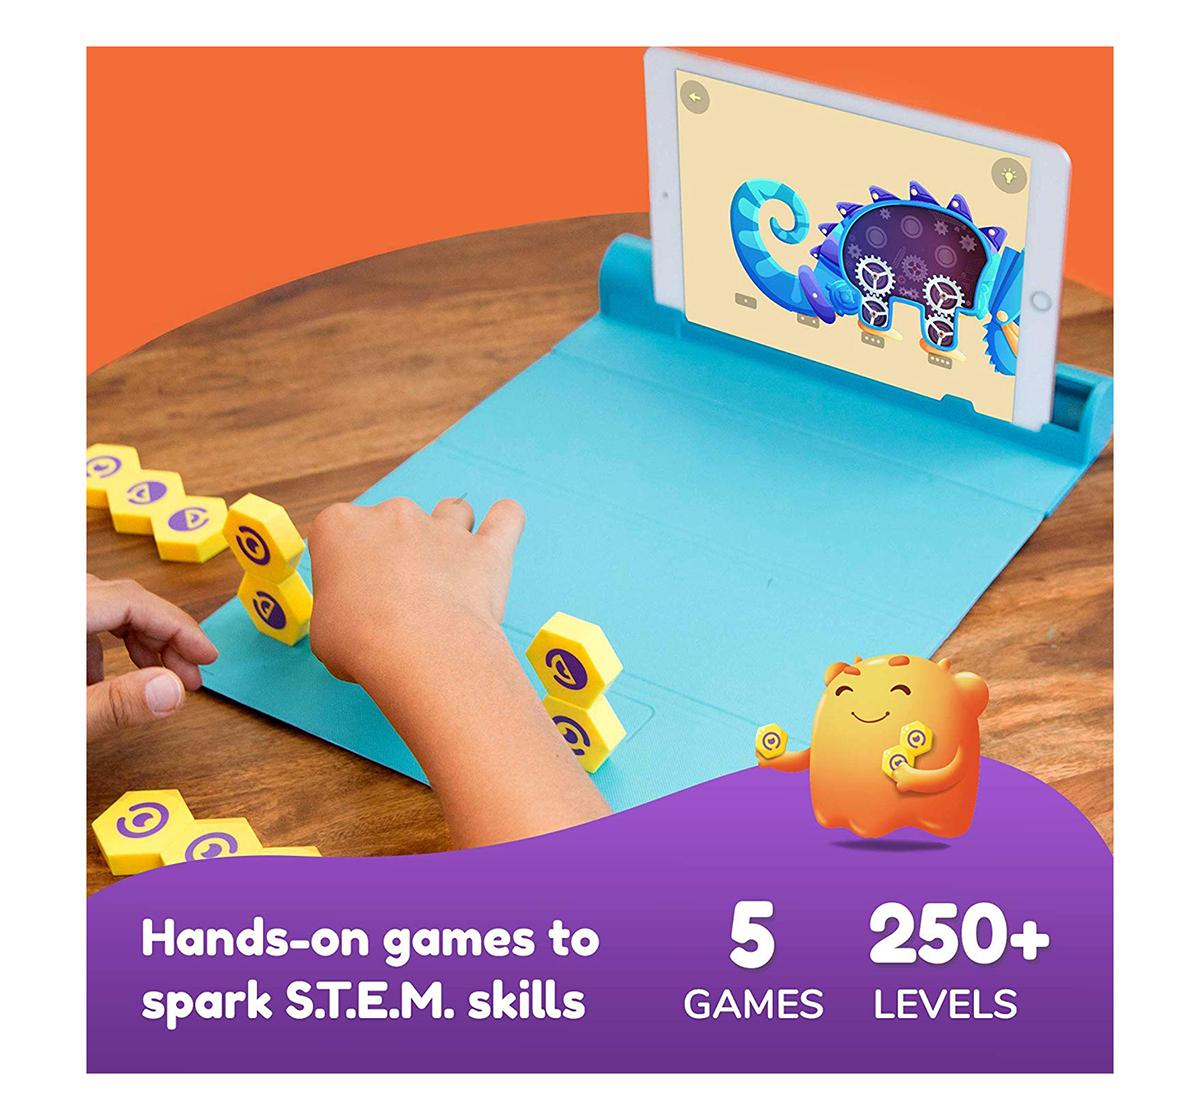 Playshifu | Playshifu Shifu Plugo Link - Construction Kit Games for Kids age 5Y+